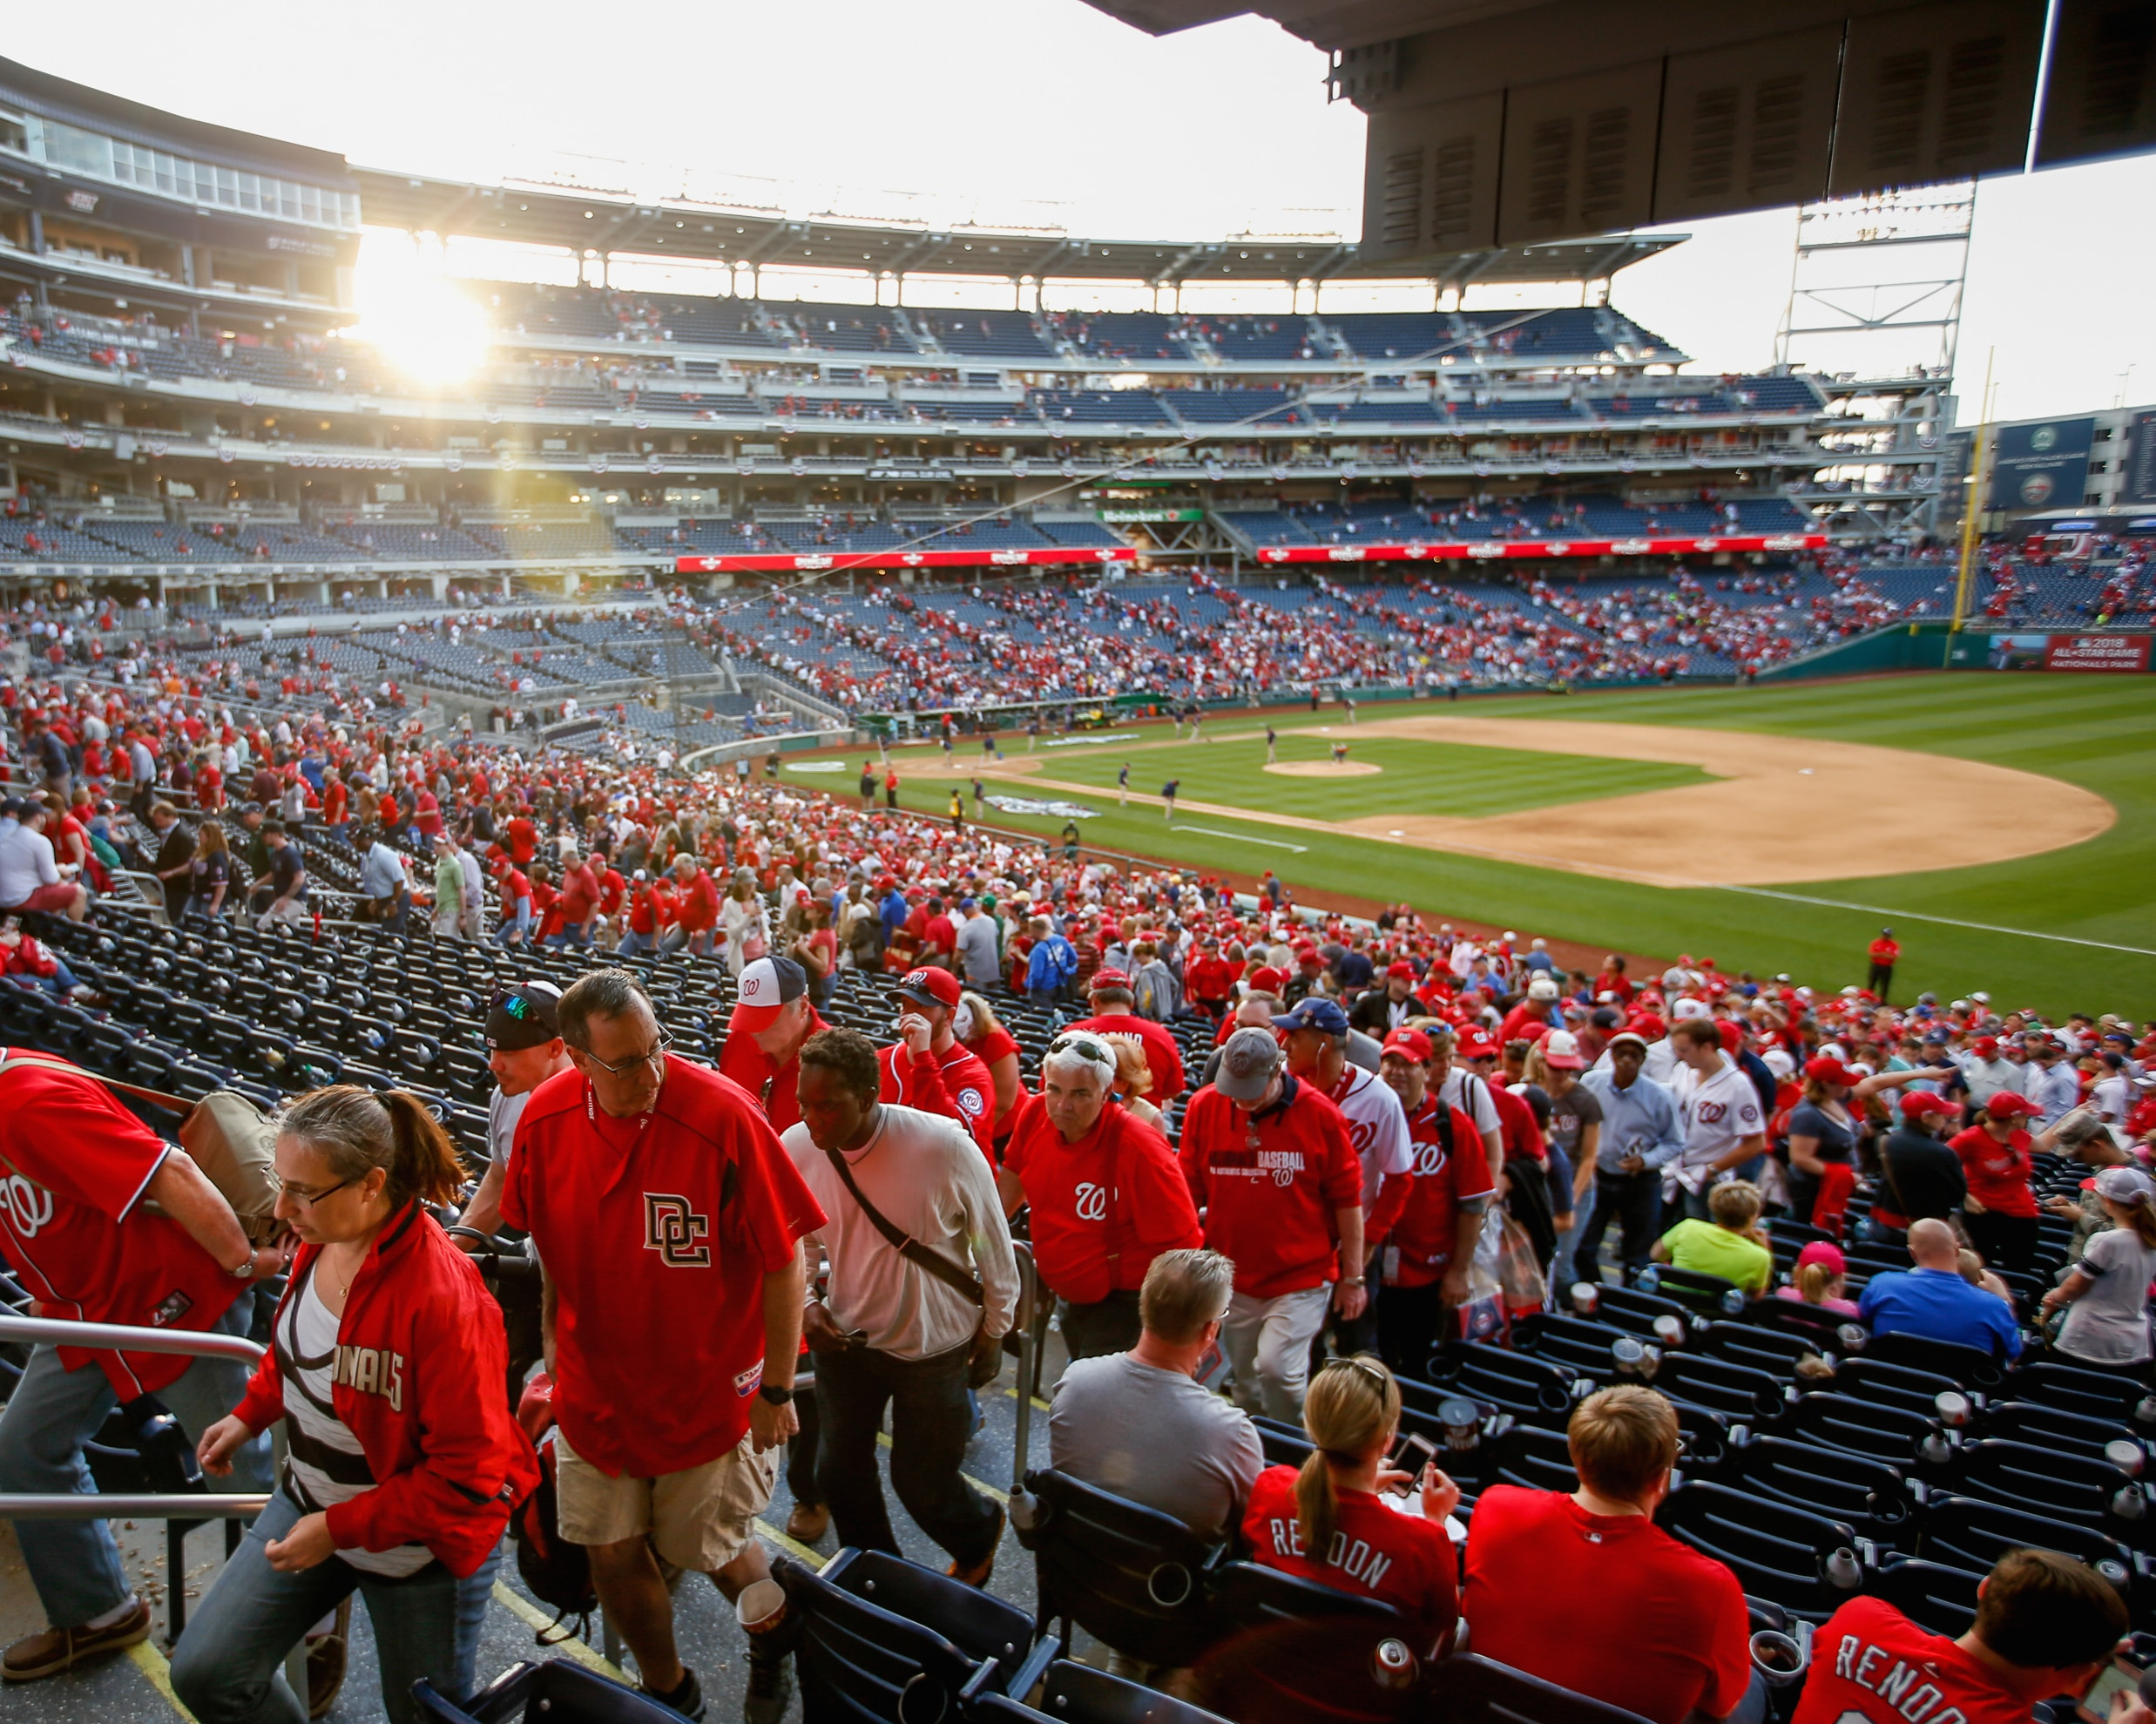 Baseball fans dressed in Nationals apparel leaving stadium (© AP Images)